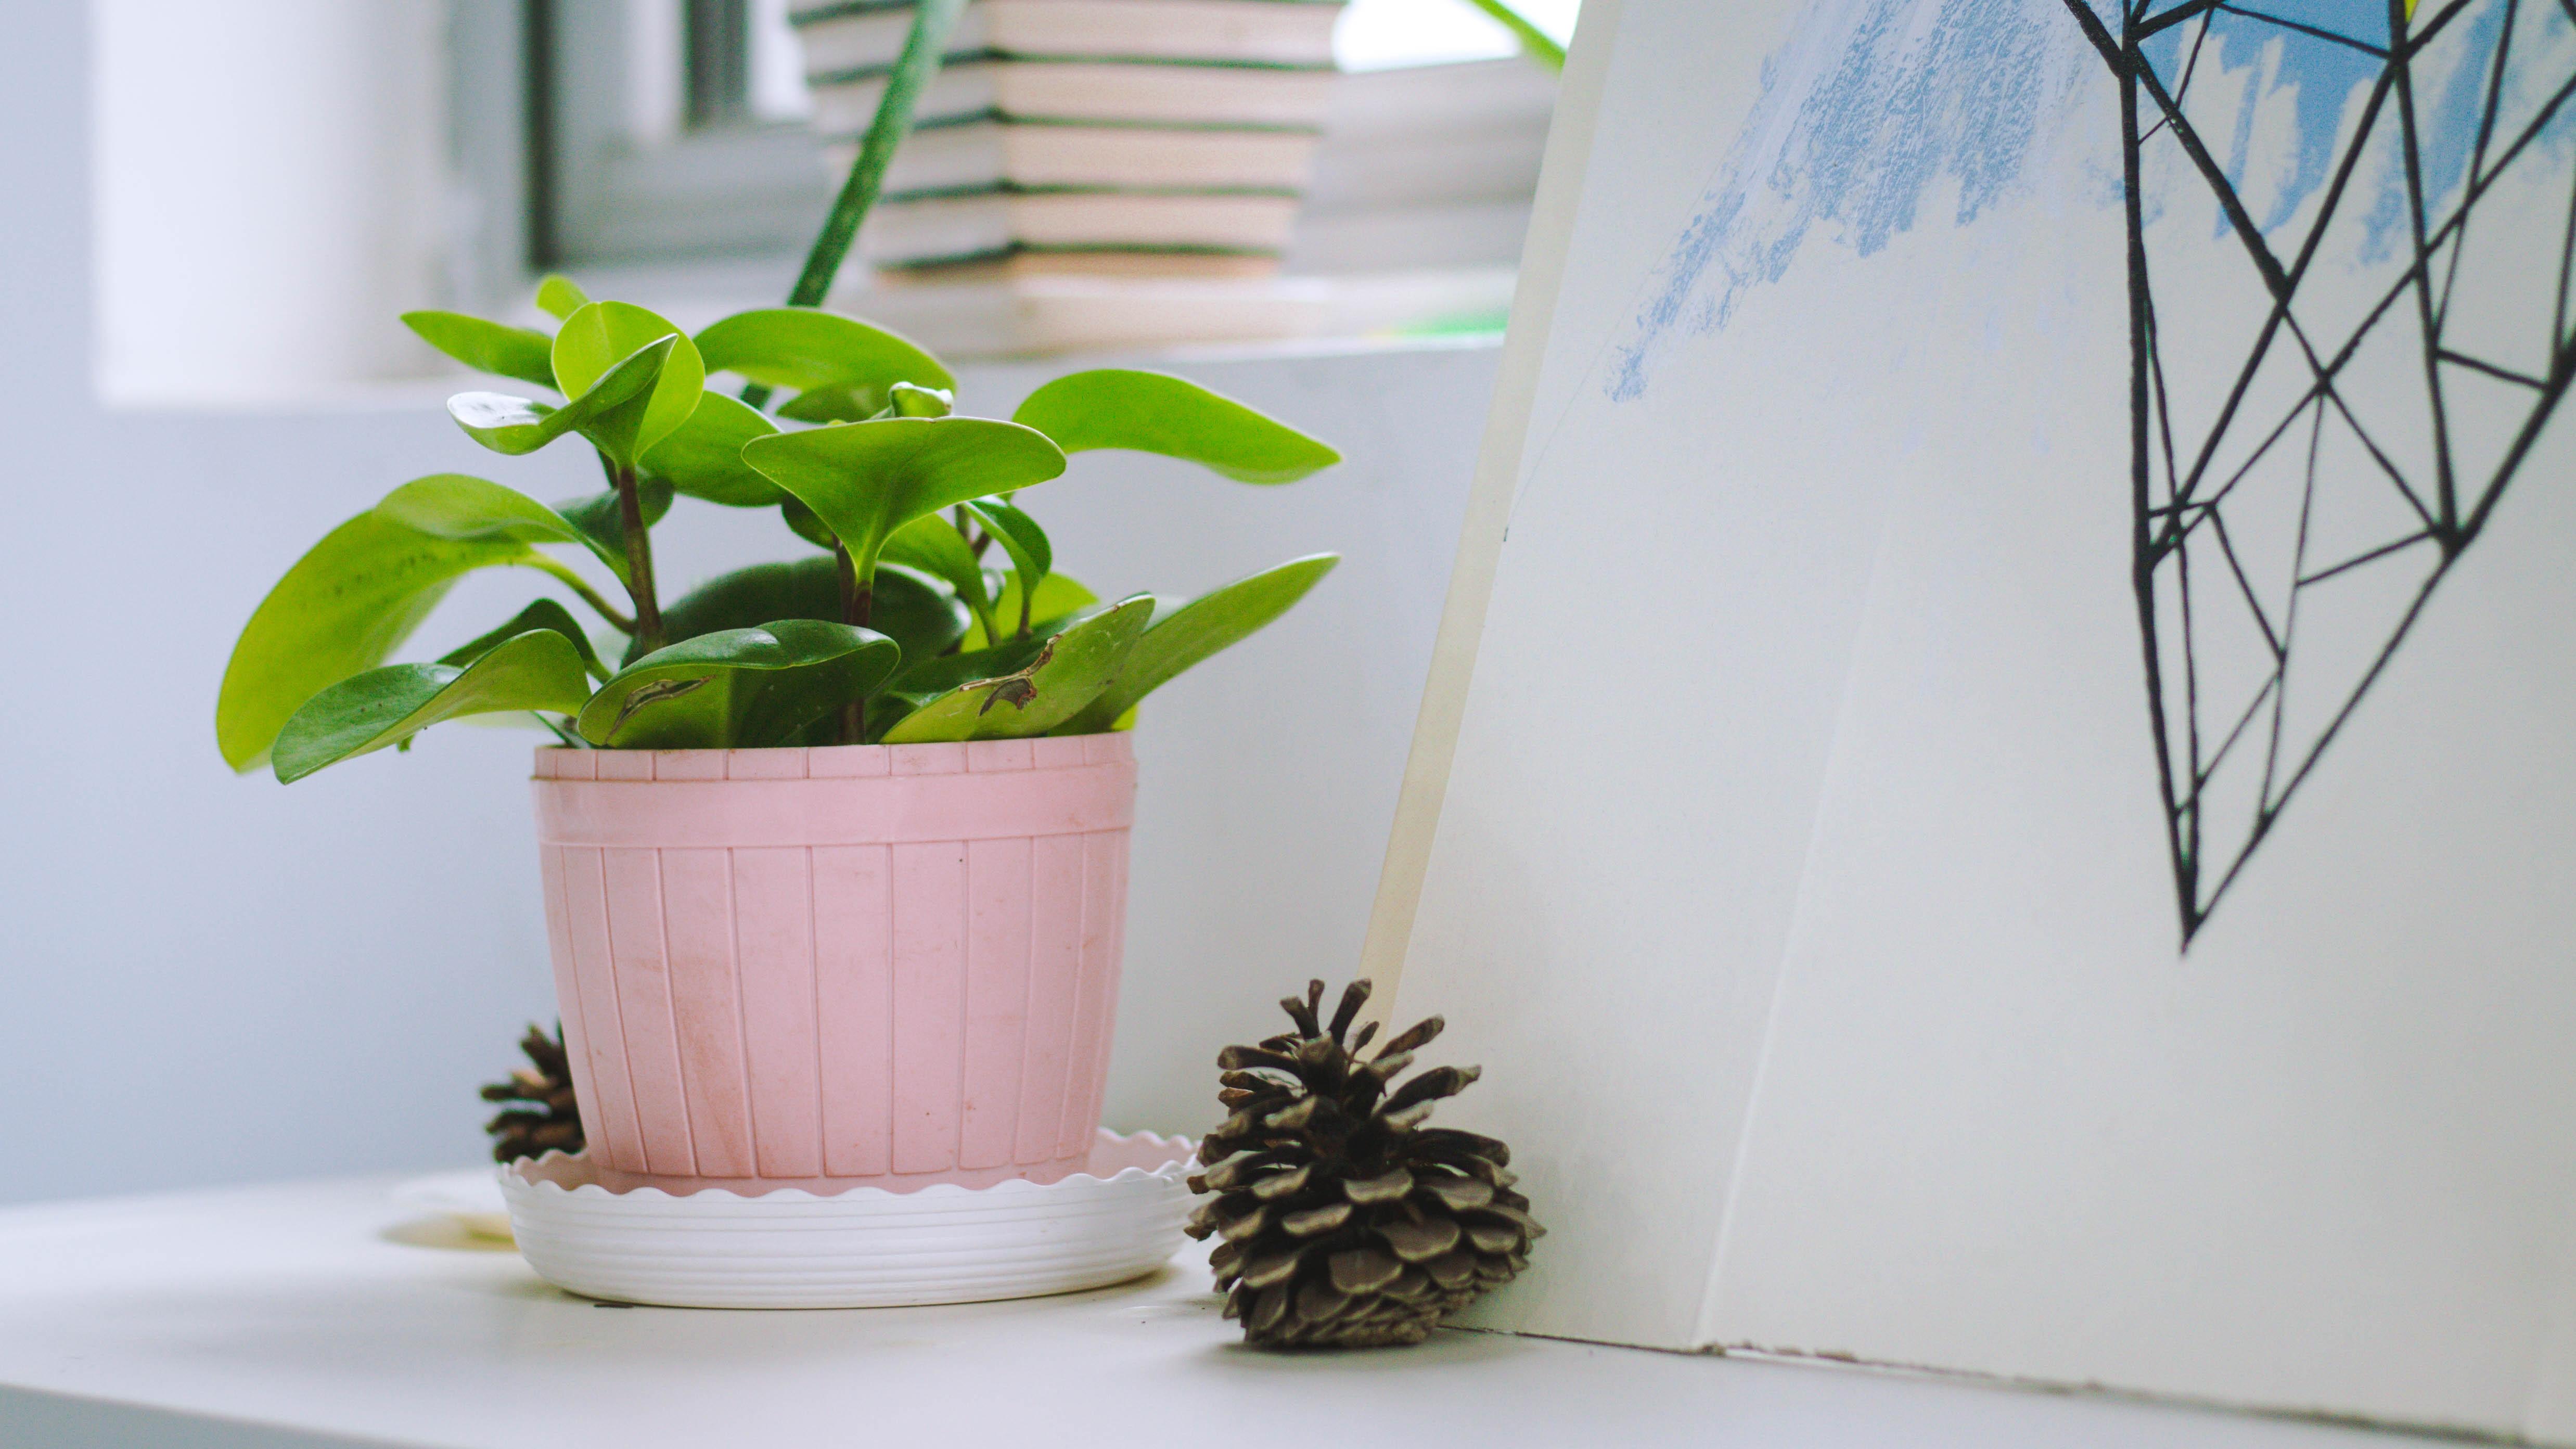 Free images plant flower green desktop indoor for Indoor flower design